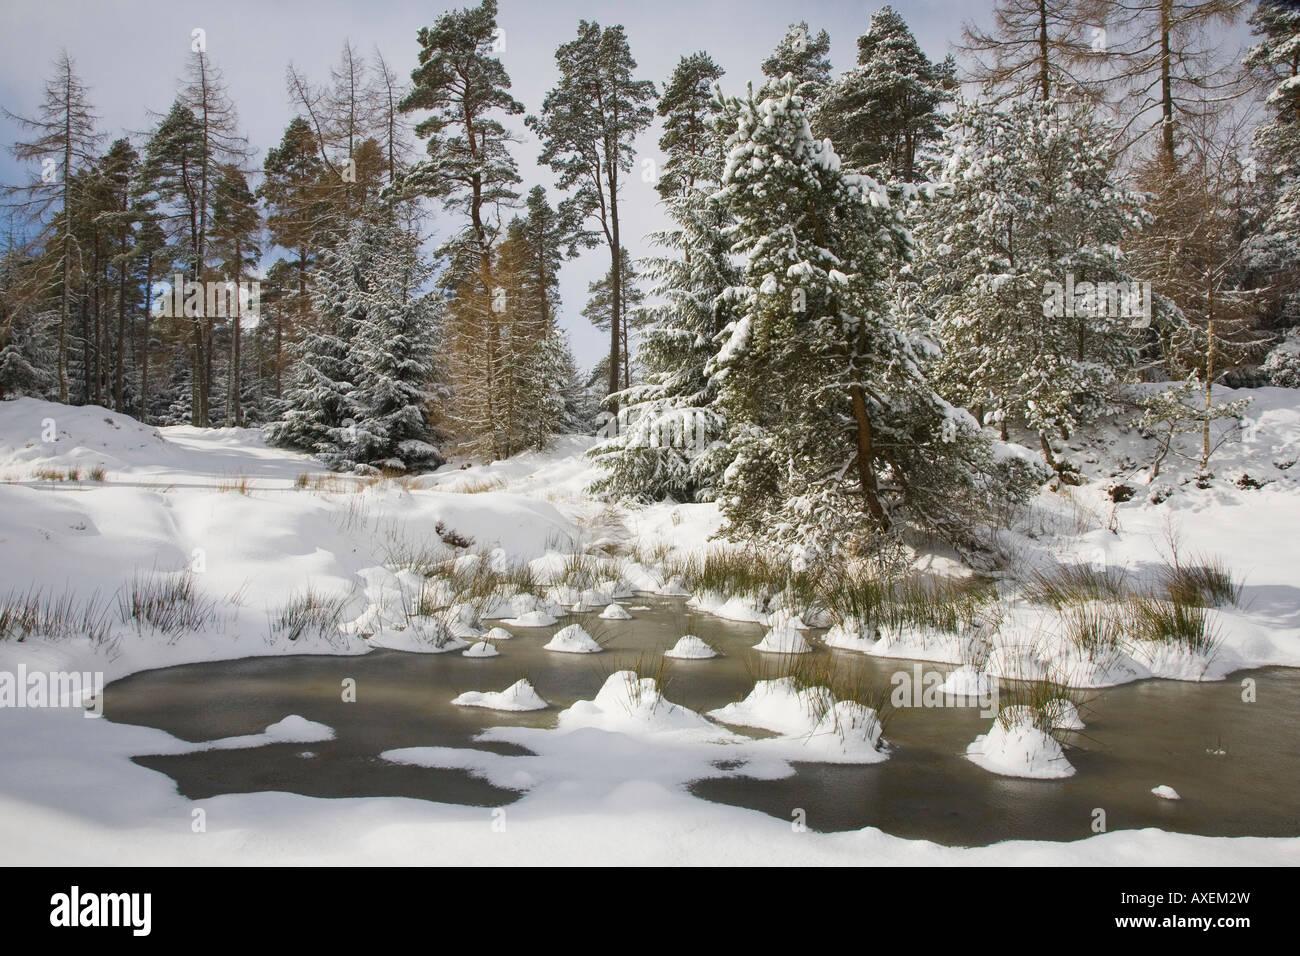 Scottish rural winter snow forest landscape, Cairngorms National Park, Scotland uk - Stock Image